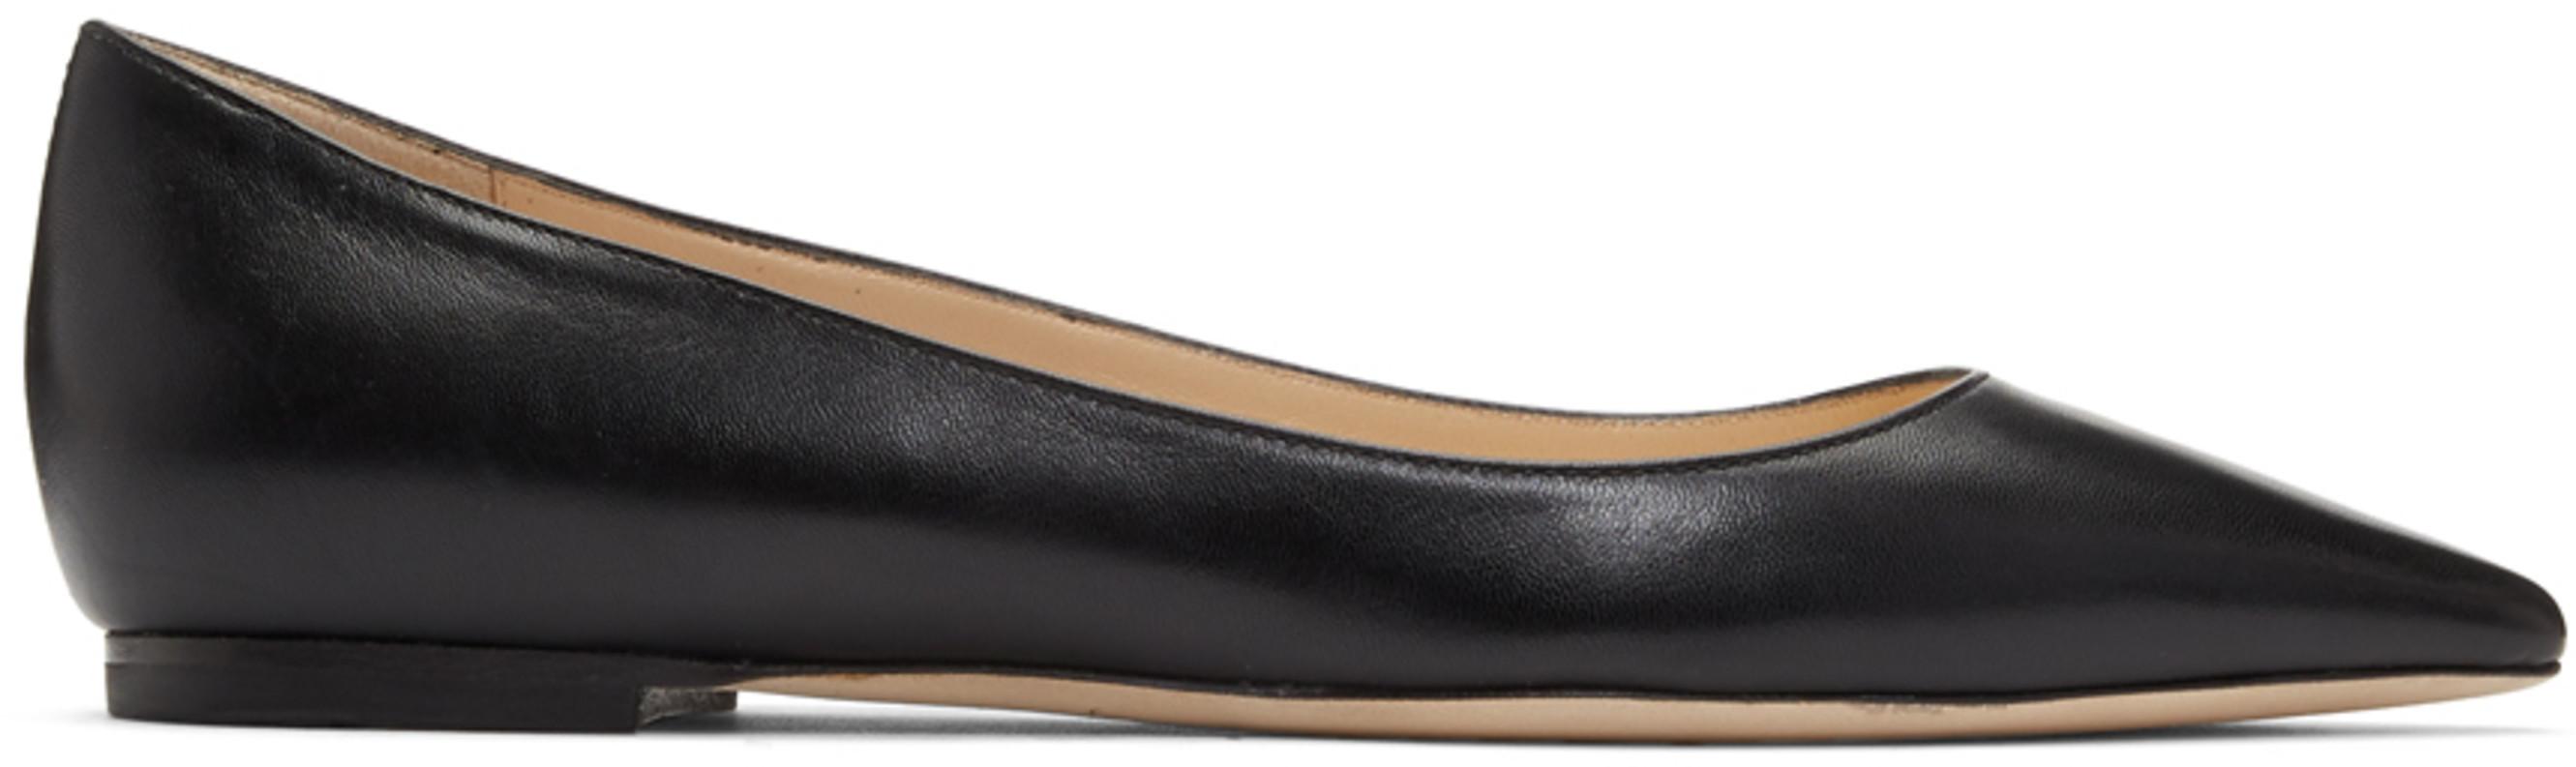 900ca5945fd Black Leather Romy Flats